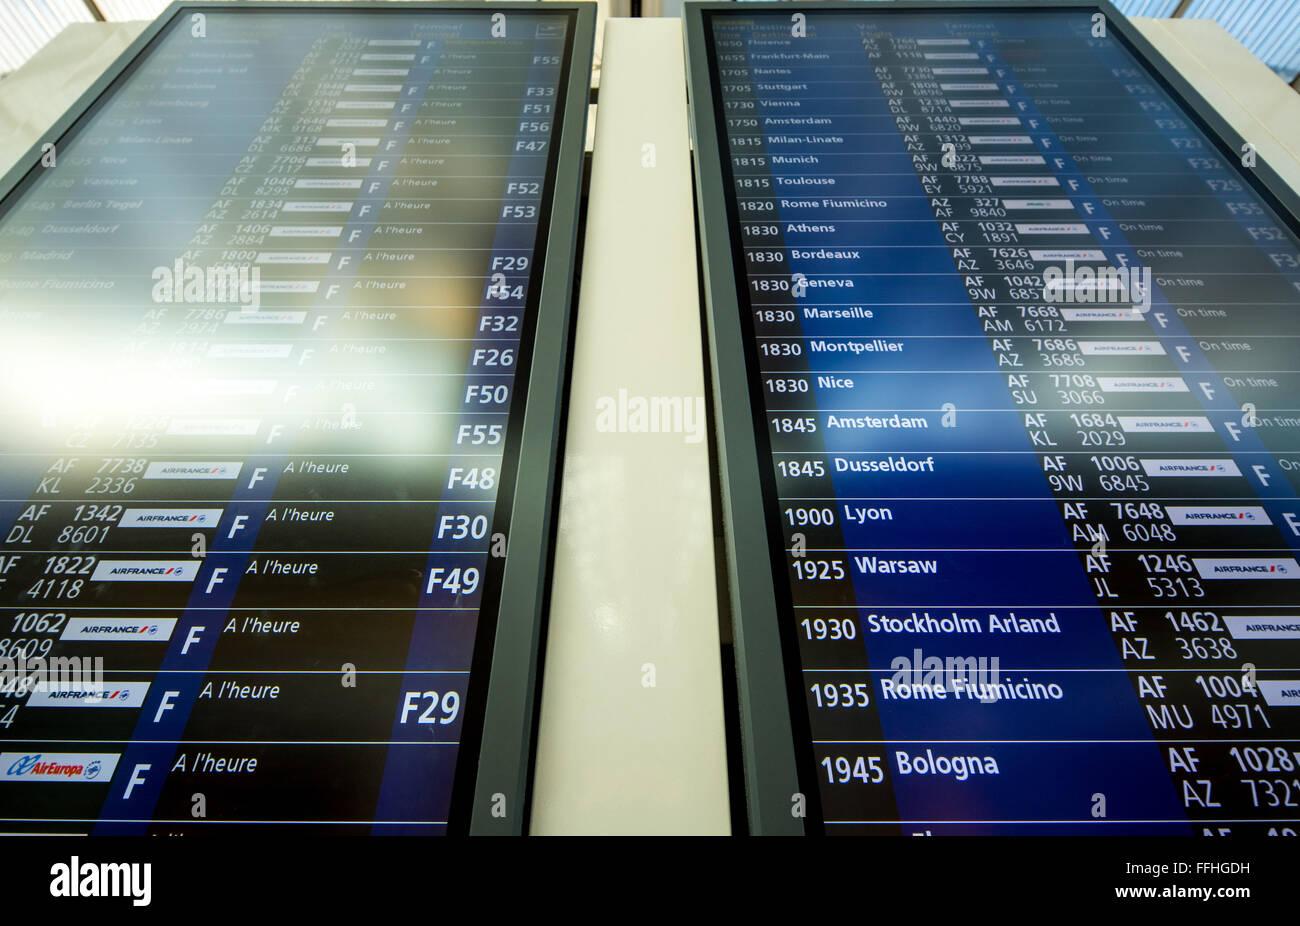 Flight scoreboard, Arrival and departure displays, AIR FRANCE flights, flight information, CDG airport, Charles - Stock Image